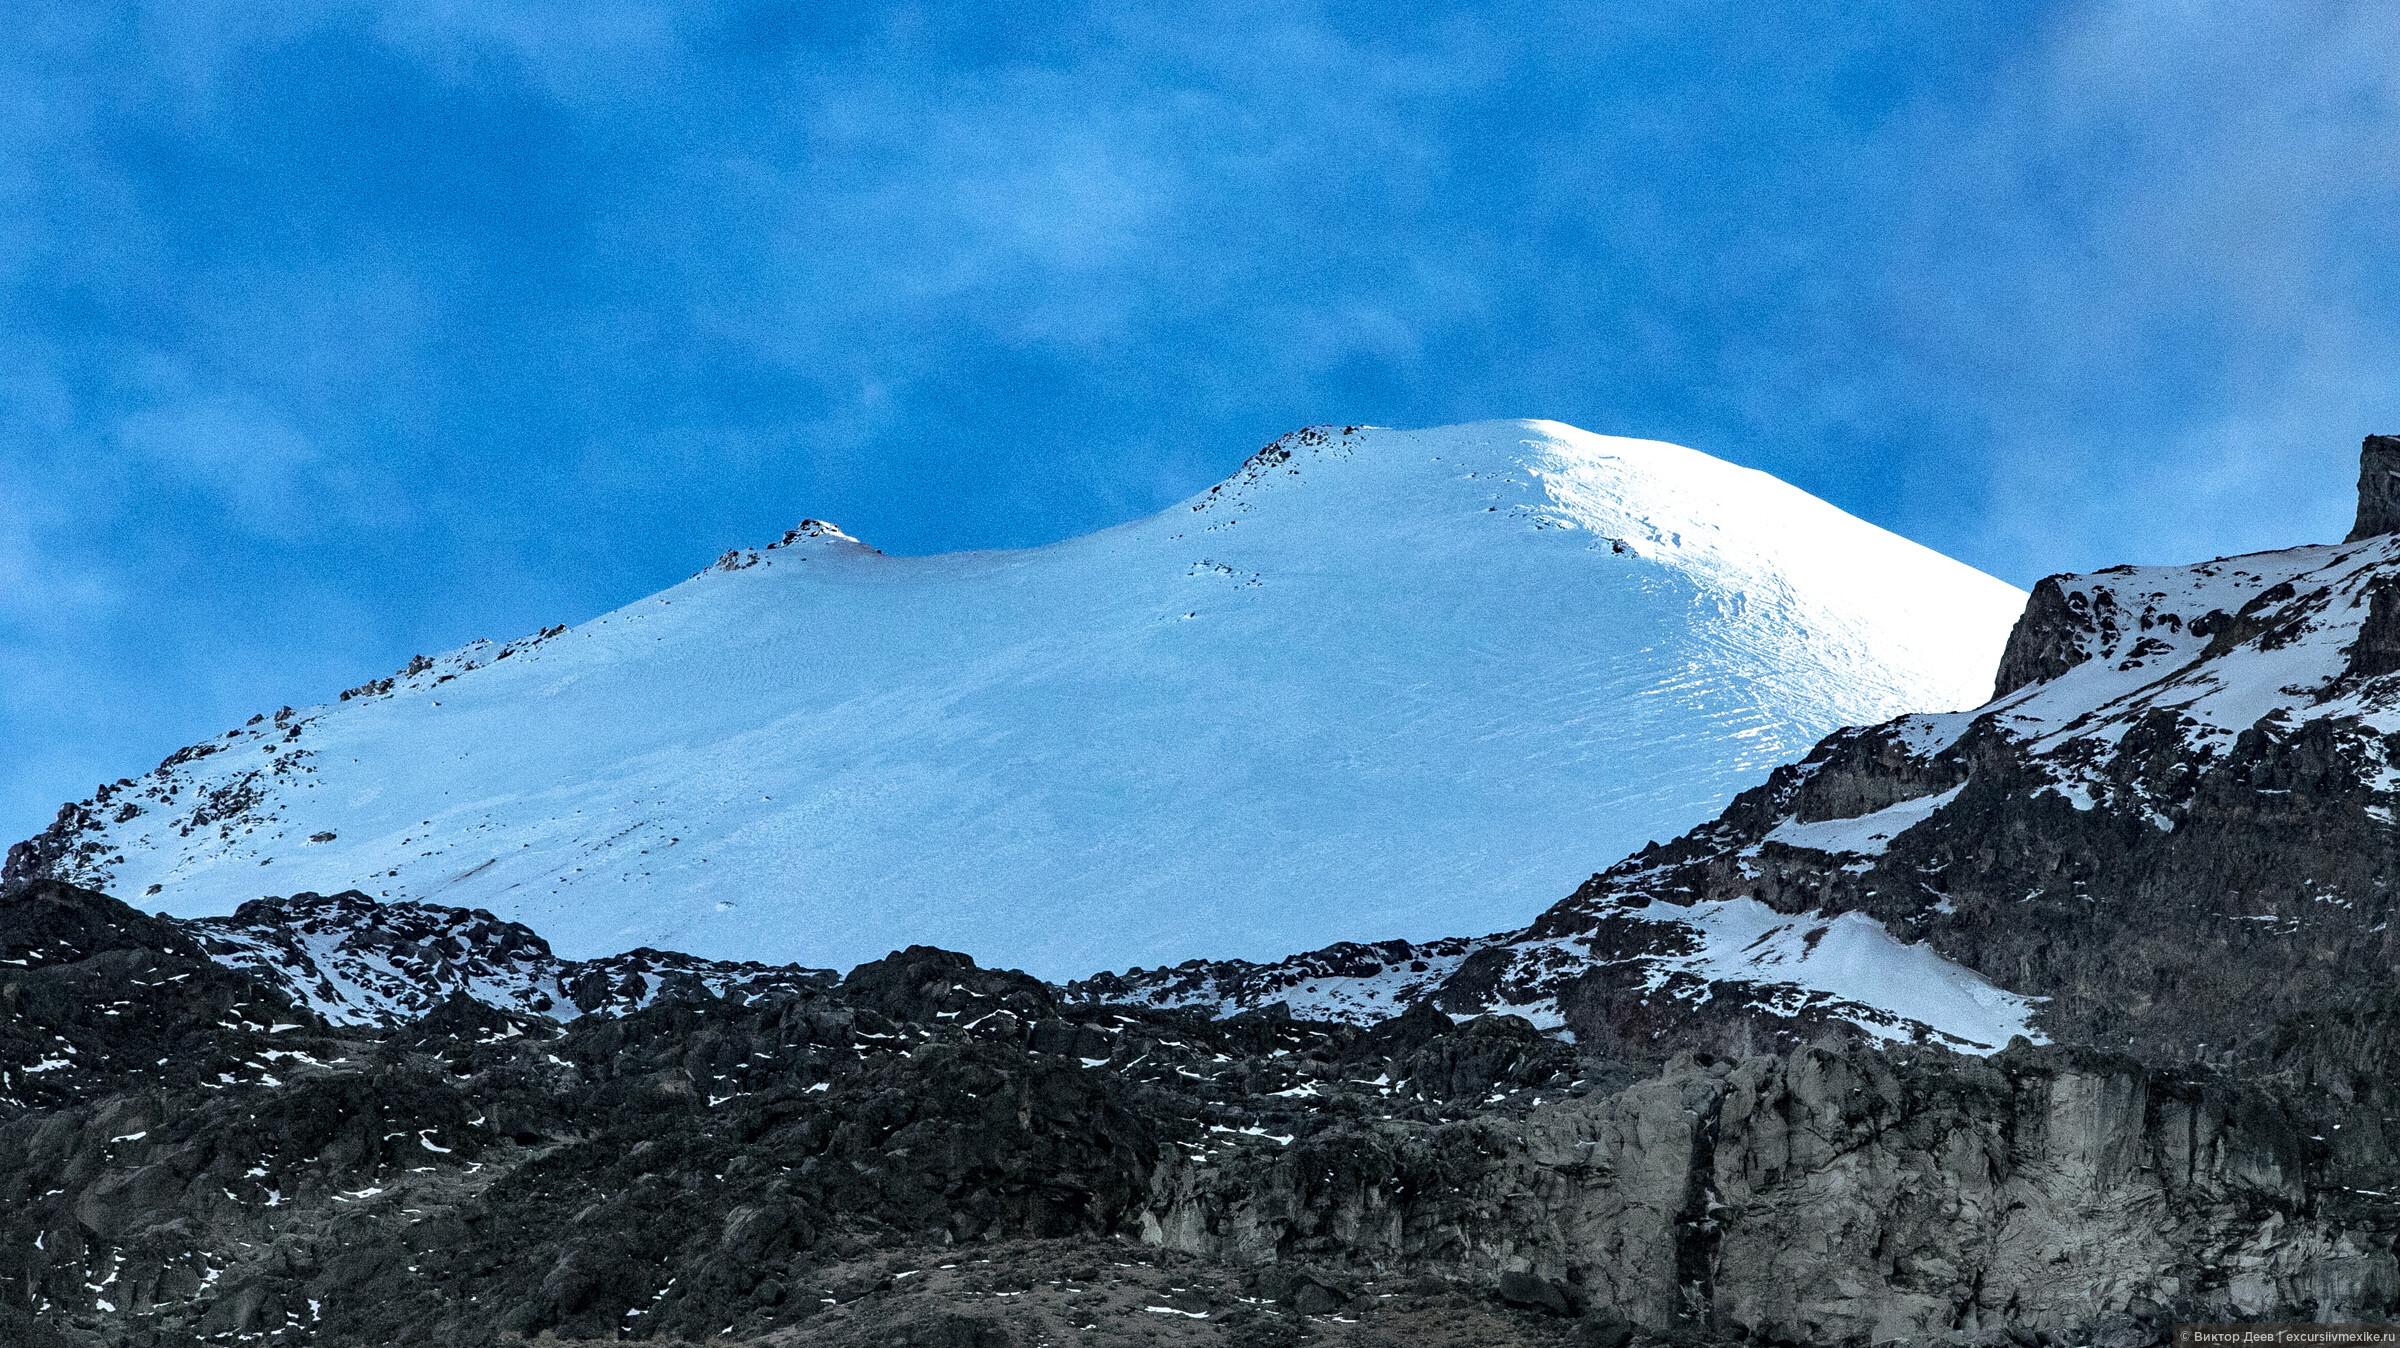 Покорение вулкана Орисабо или горное приключение Зевса и Вишни